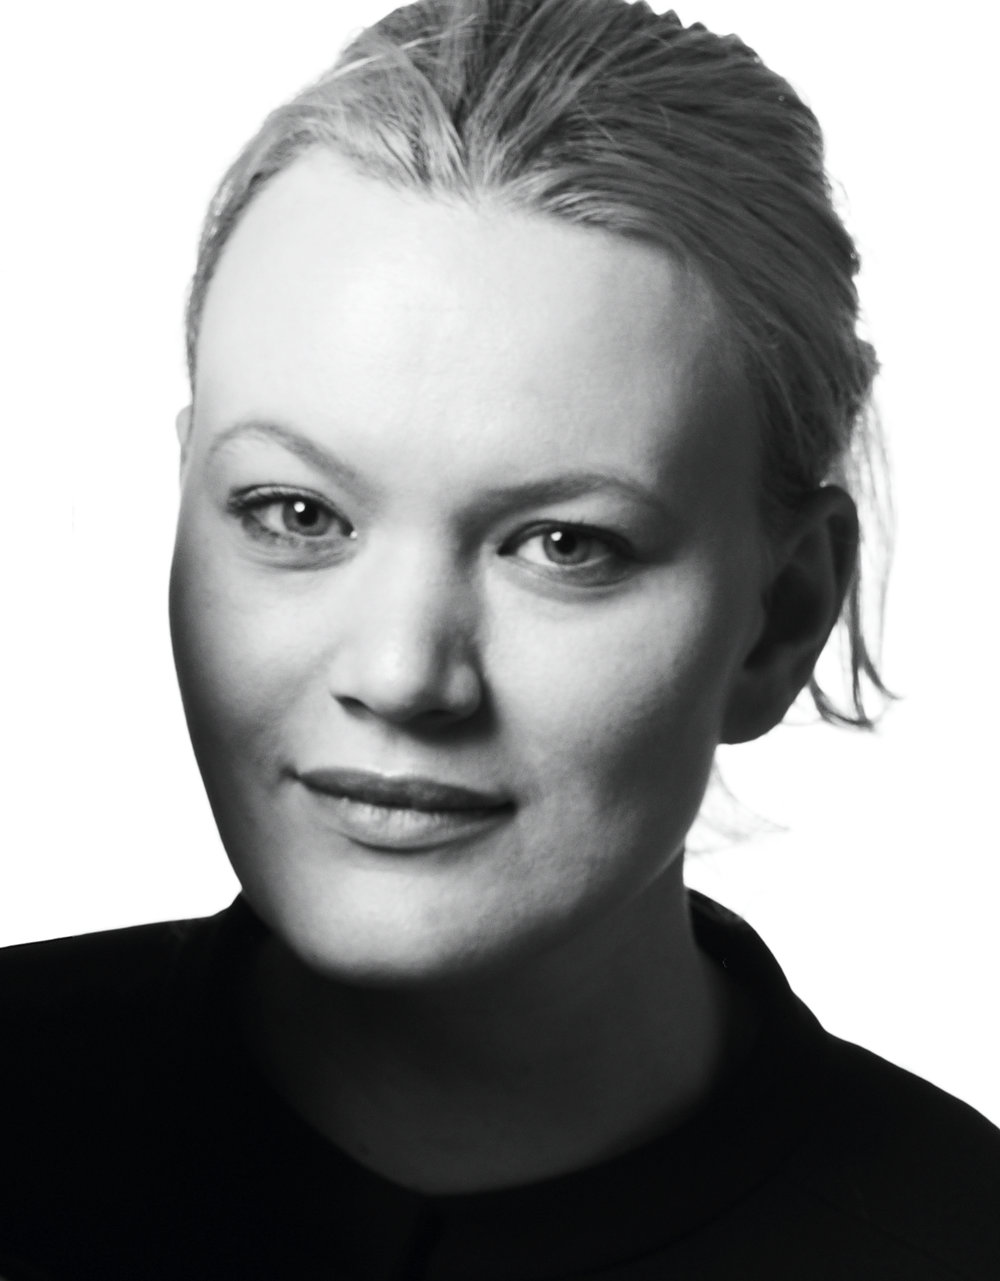 Photo by Bjarne Jonasson